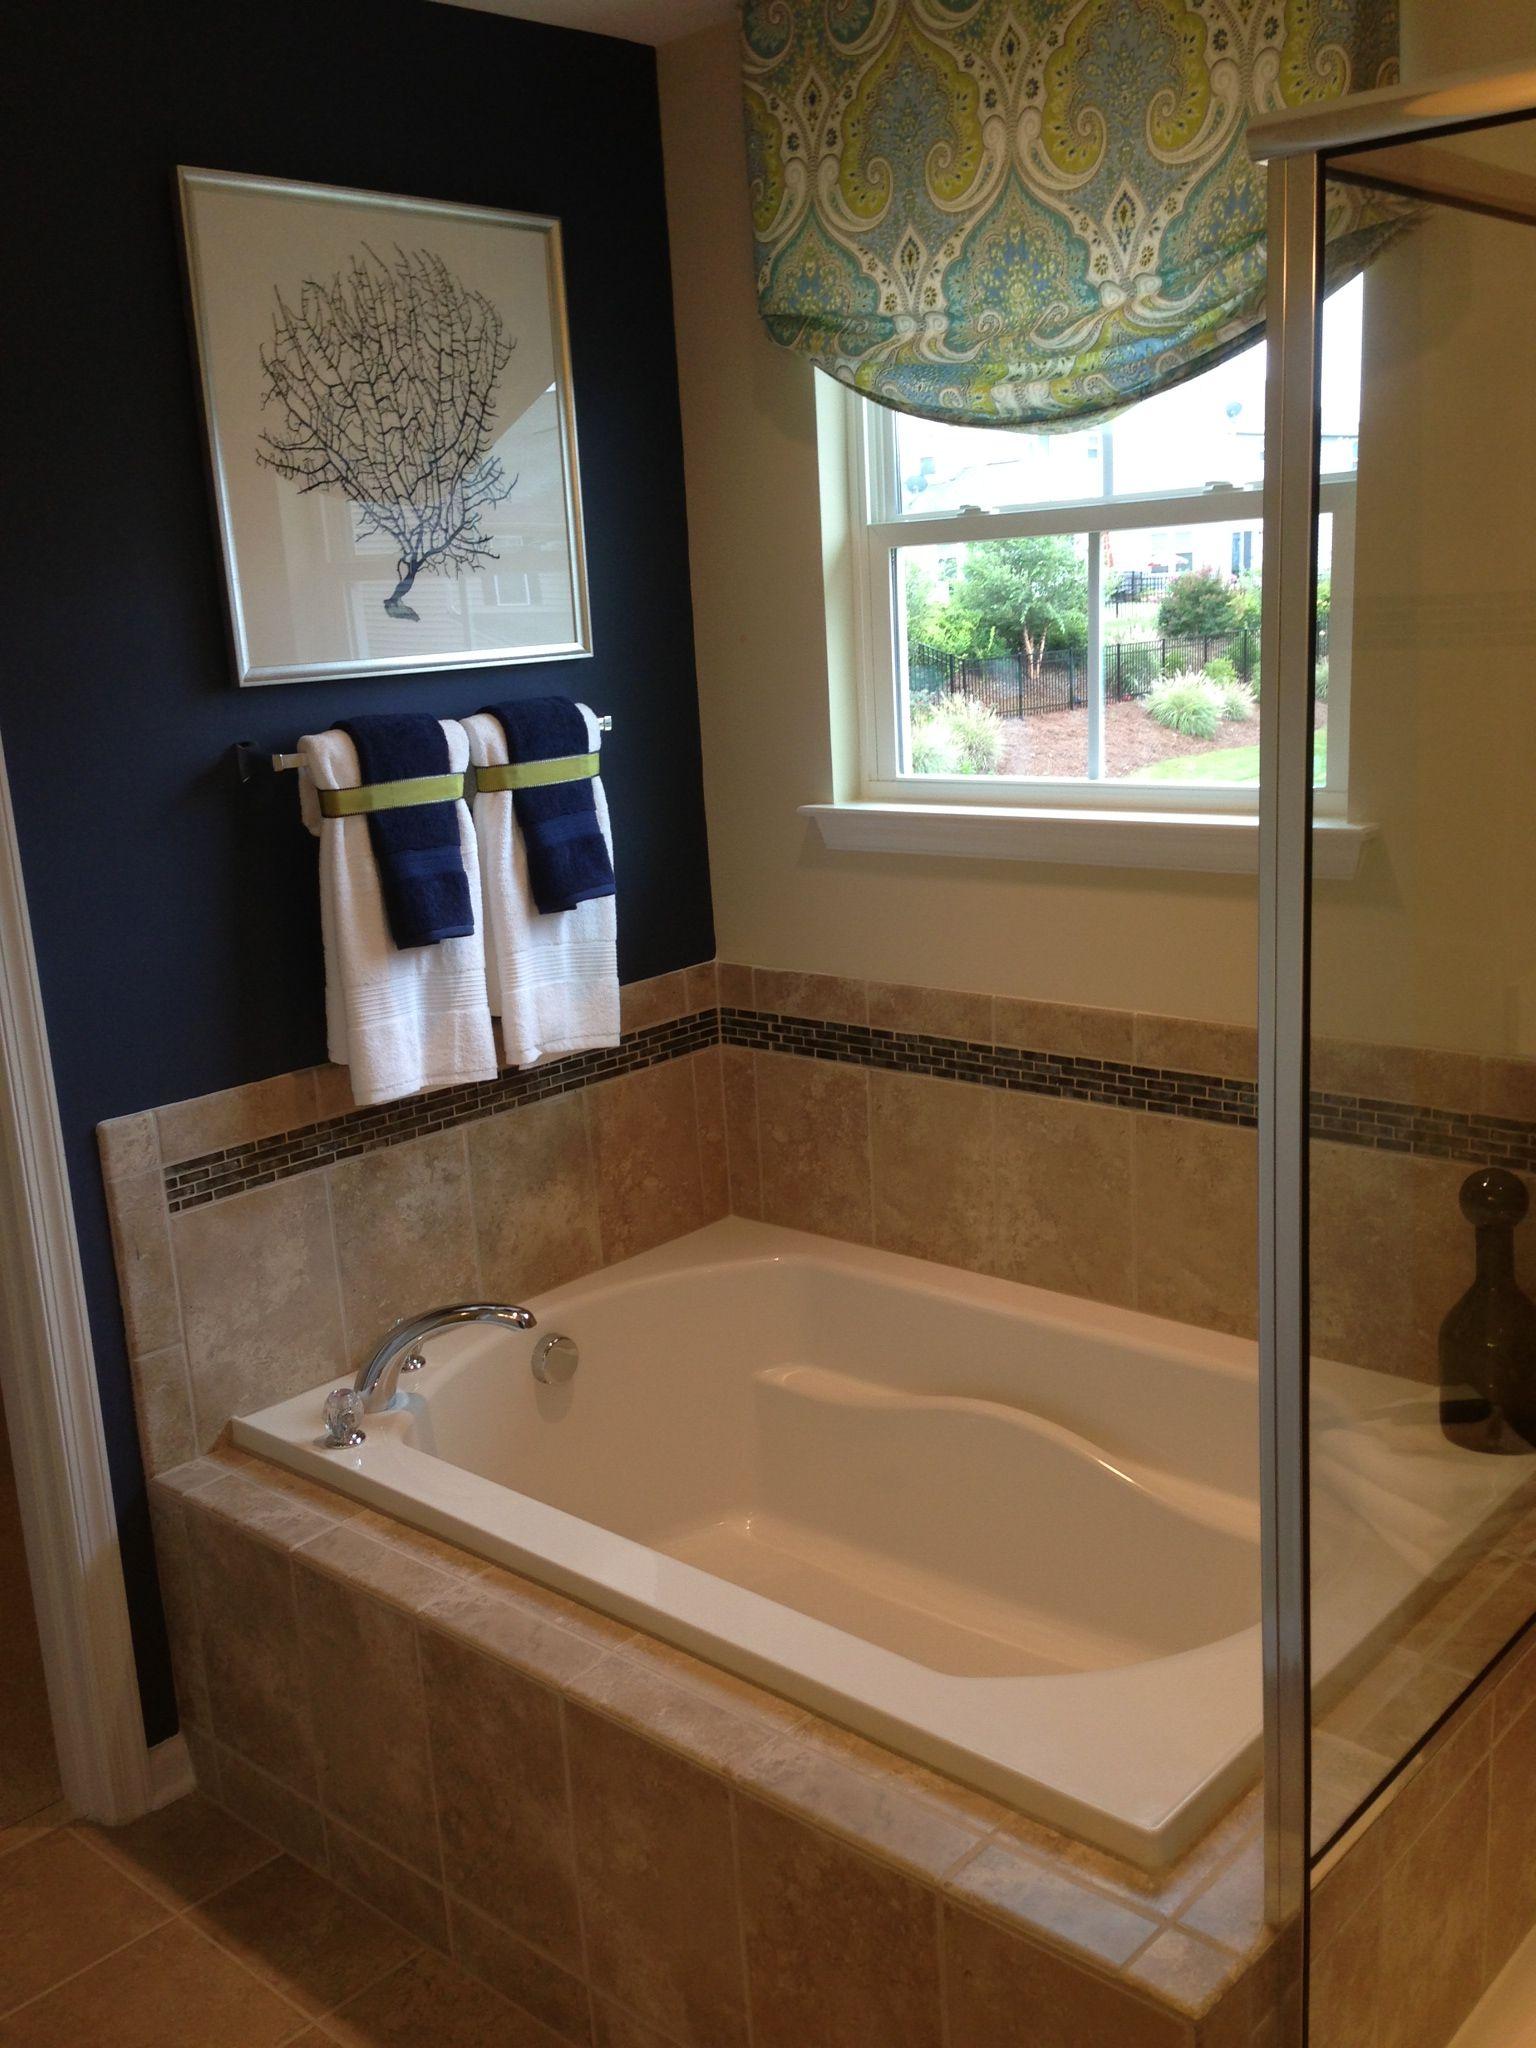 model home bathroom decor photo - 2